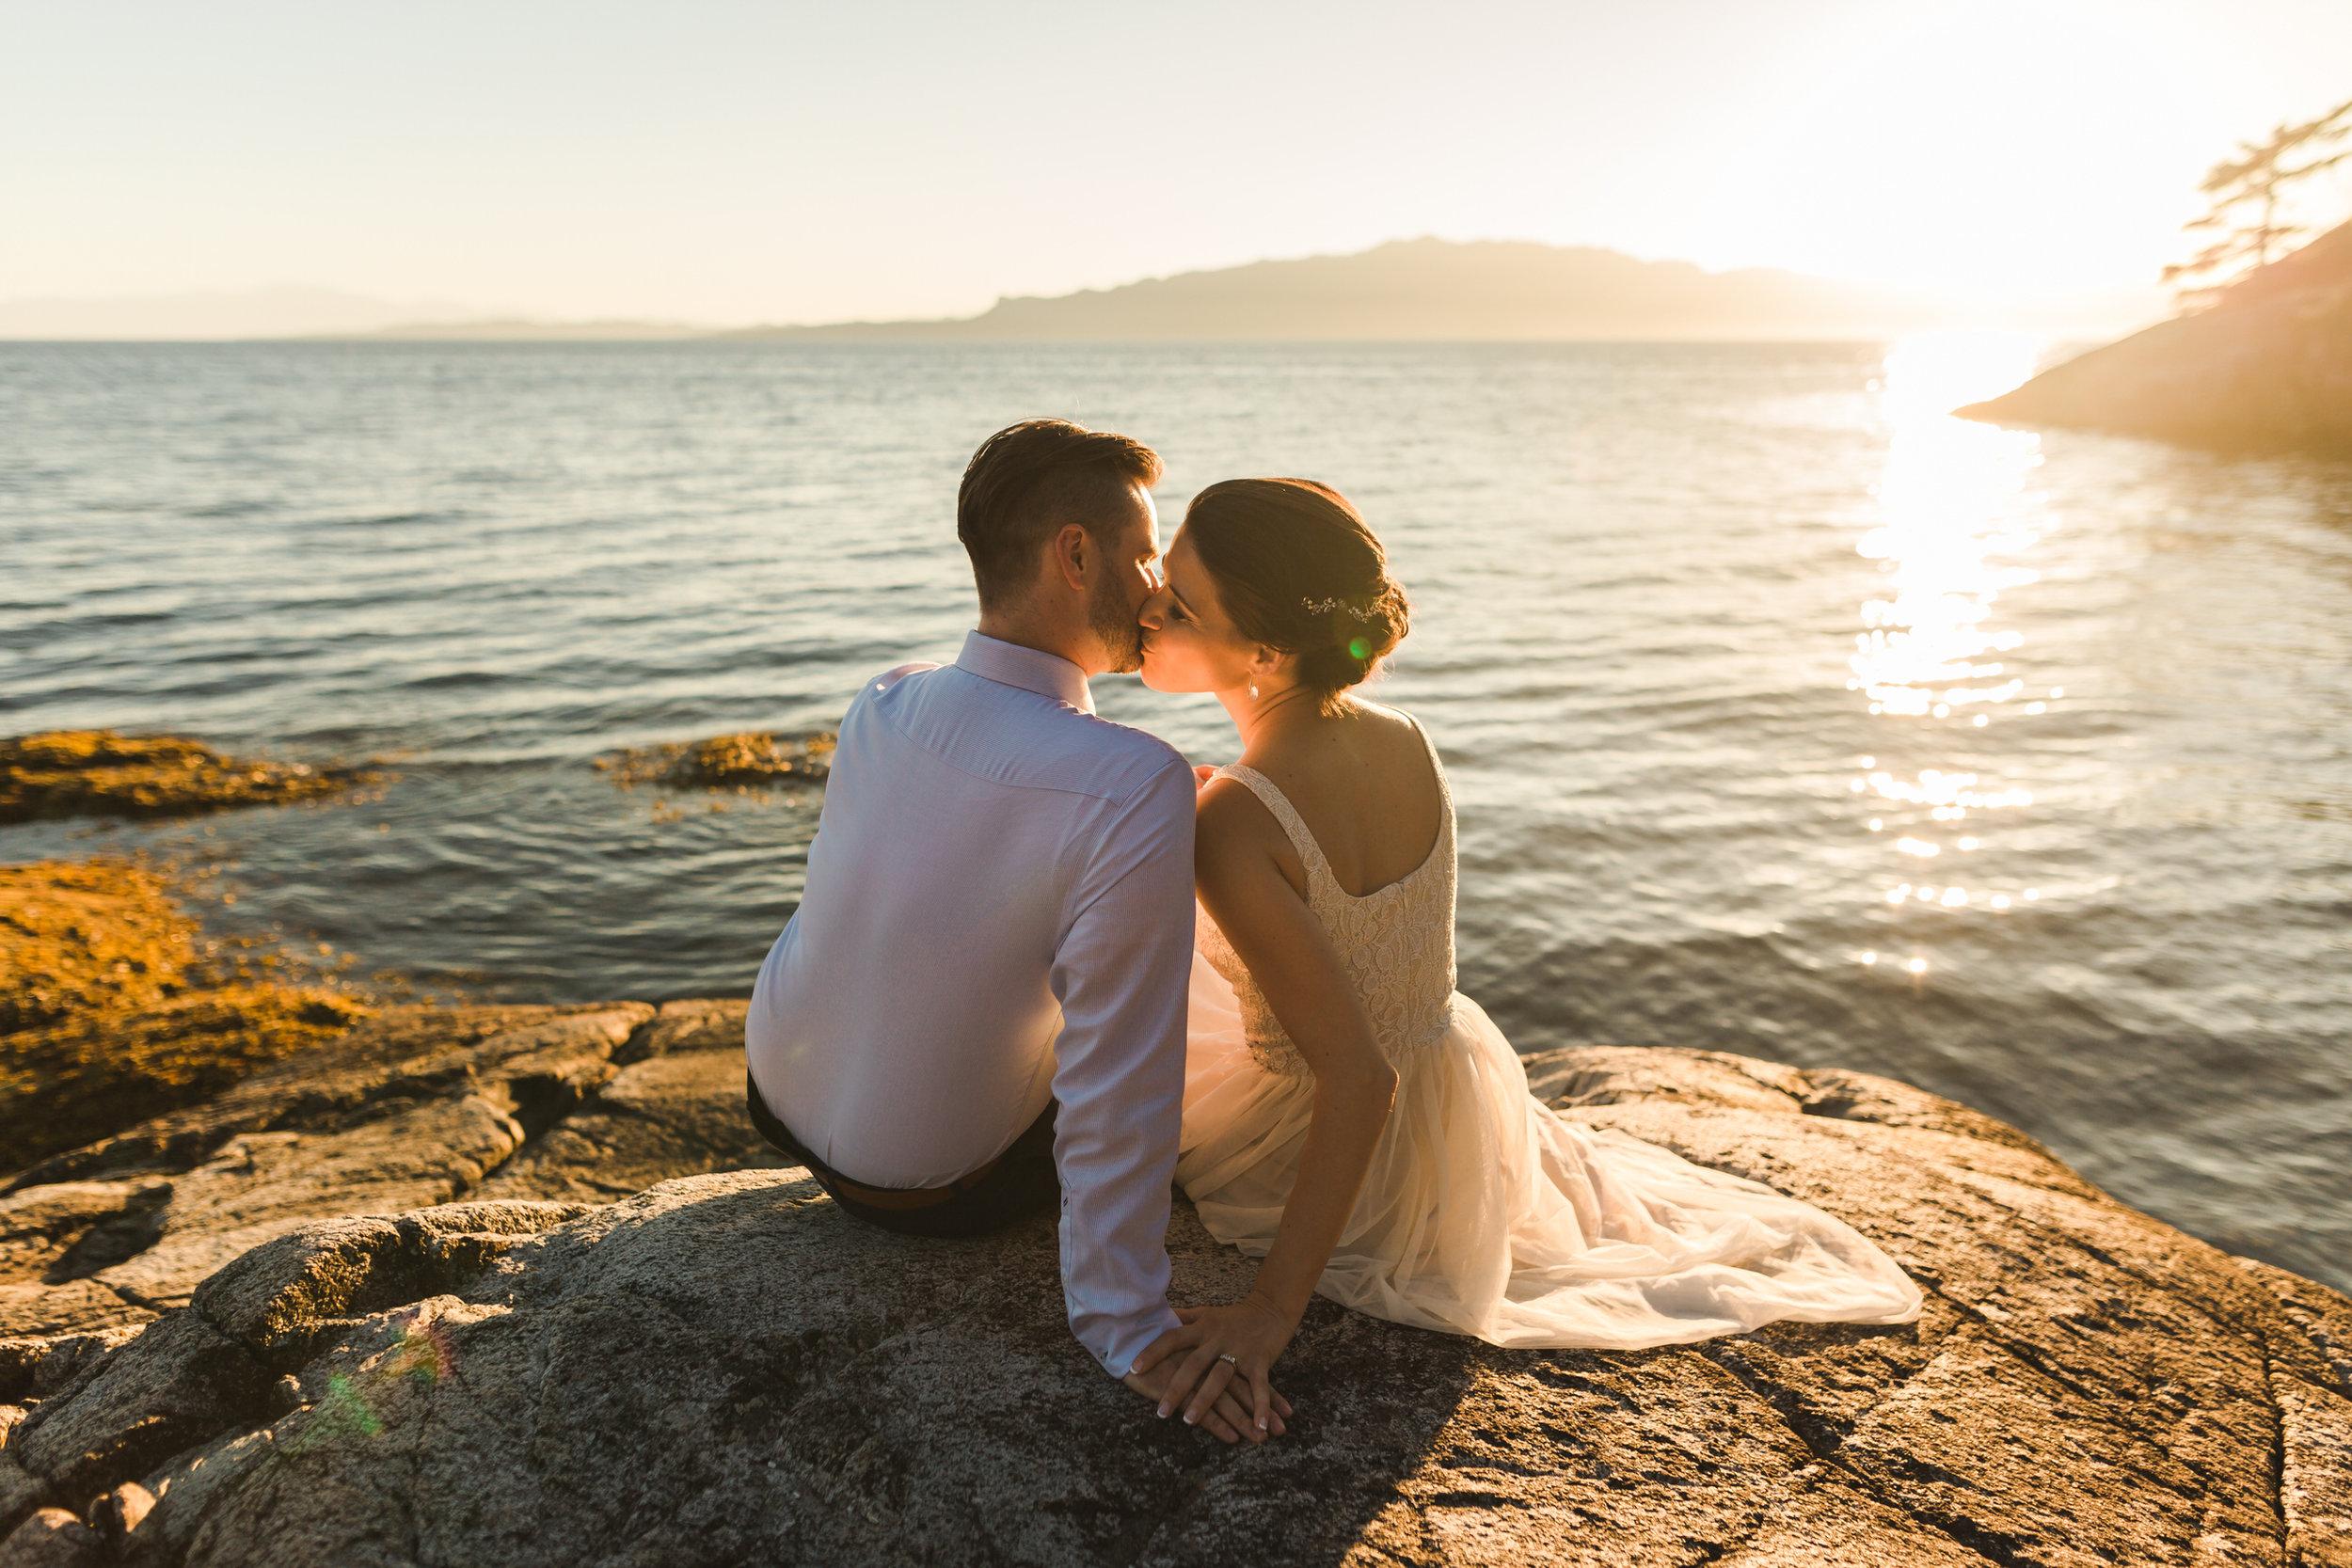 Rockwater Secret Cove Resort Wedding - Sunshine Coast BC Wedding Photographer - Vancouver Wedding Photographer - Sunshine Coast Elopement Photos - IMG_1907.jpg